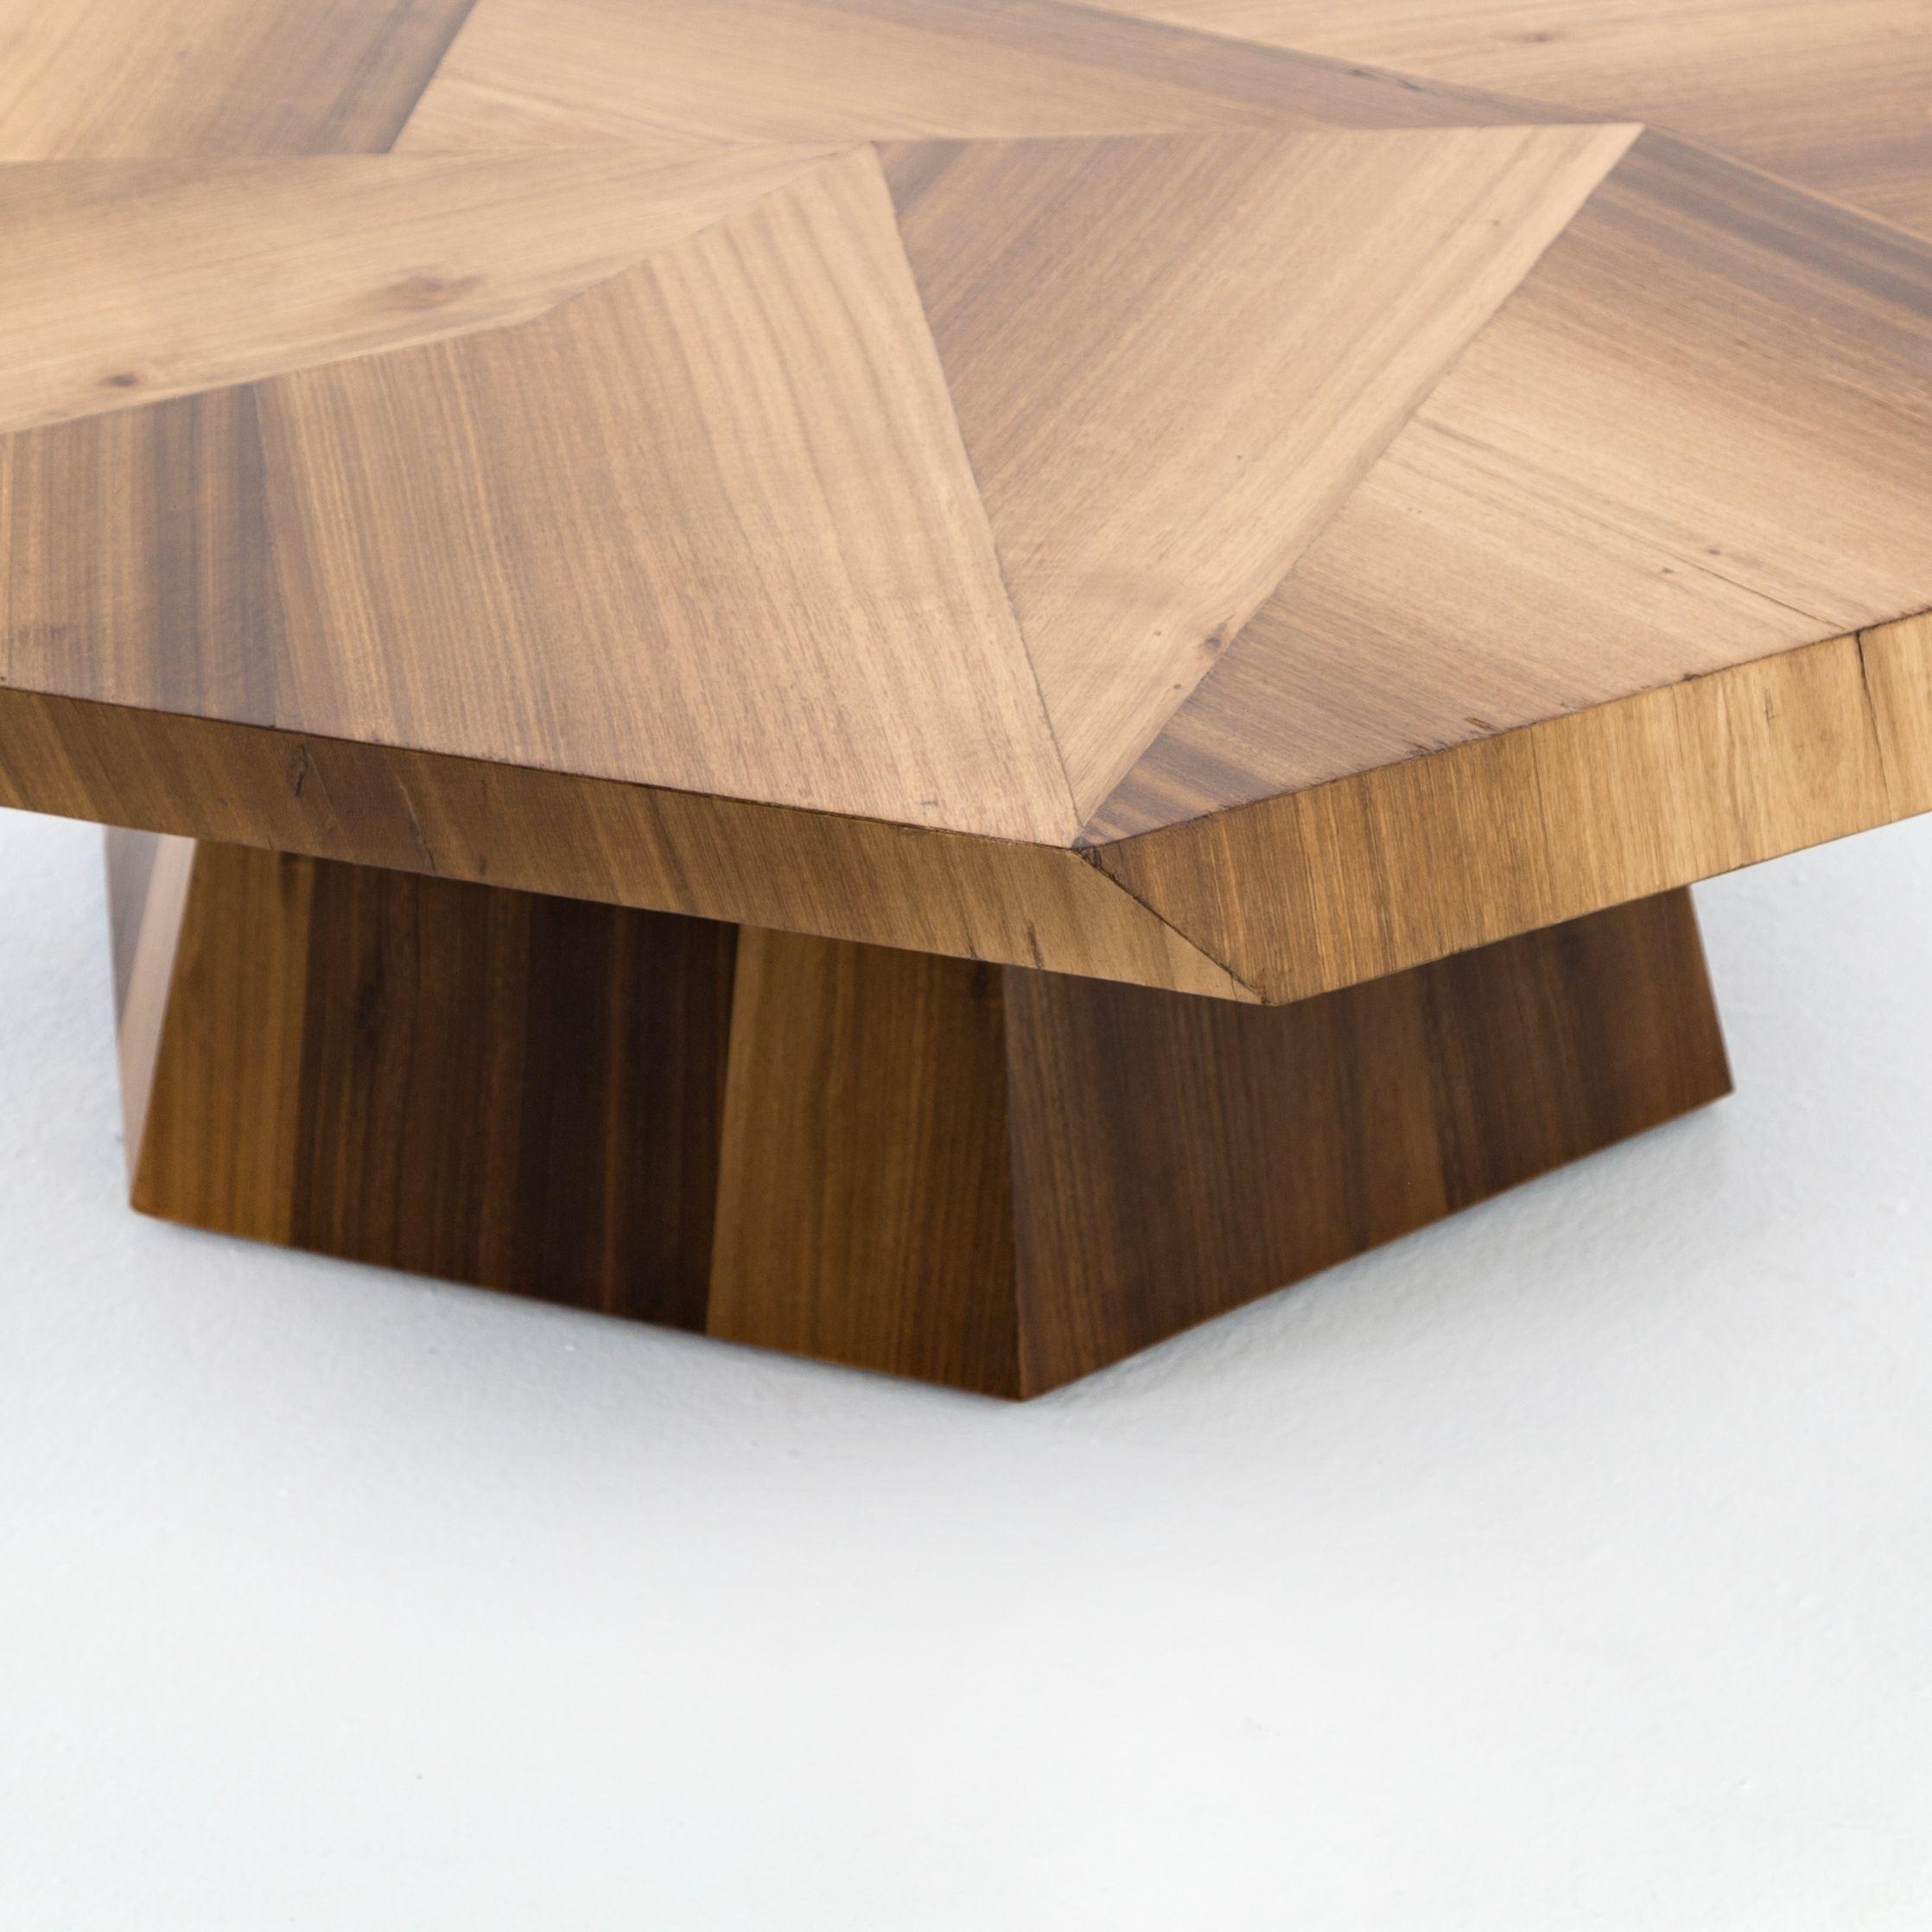 Balen Coffee Table Modern Wood Coffee Table Coffee Table Wood Made Coffee Table [ 2236 x 2236 Pixel ]